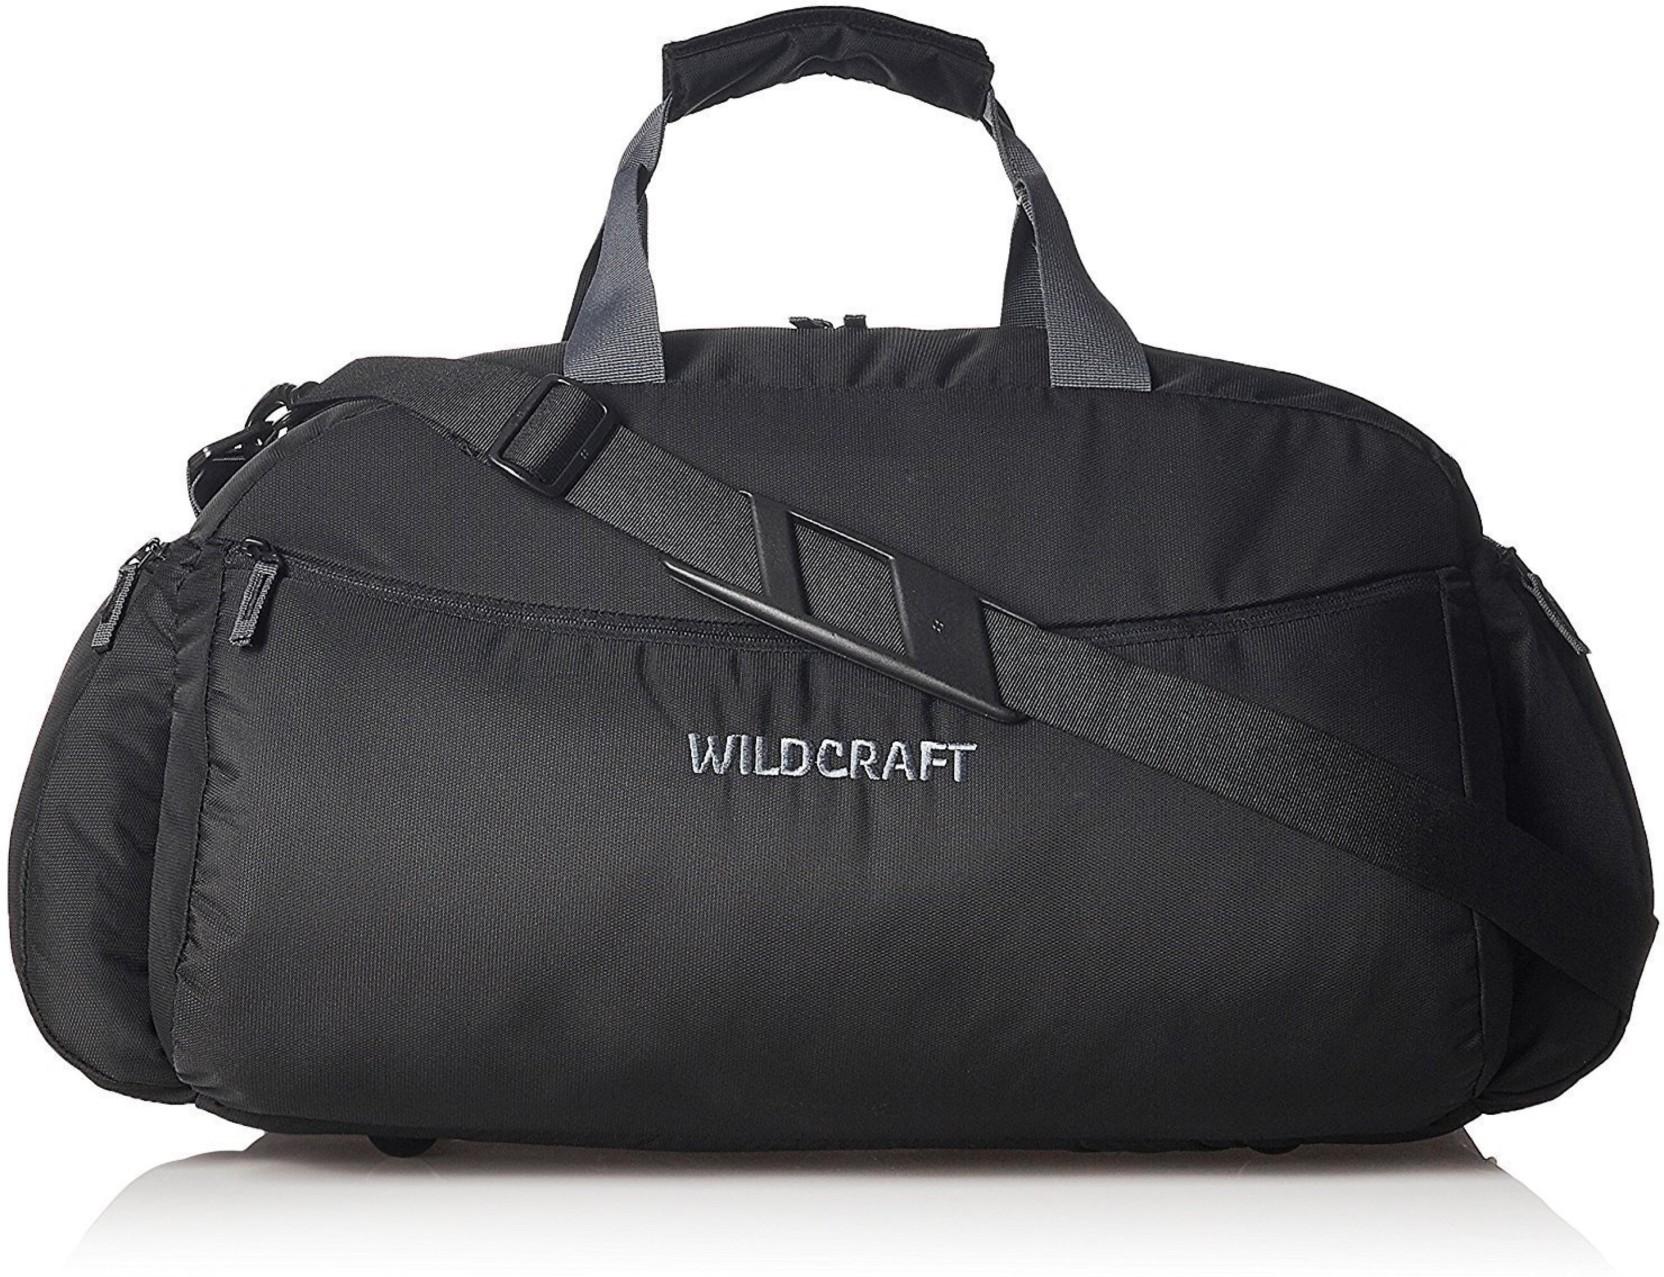 b57cc6fed5 Wildcraft 13464 inch 34199 cm Orbit Nova 2 Black L Duffle Travel Duffel Bag  (Black)